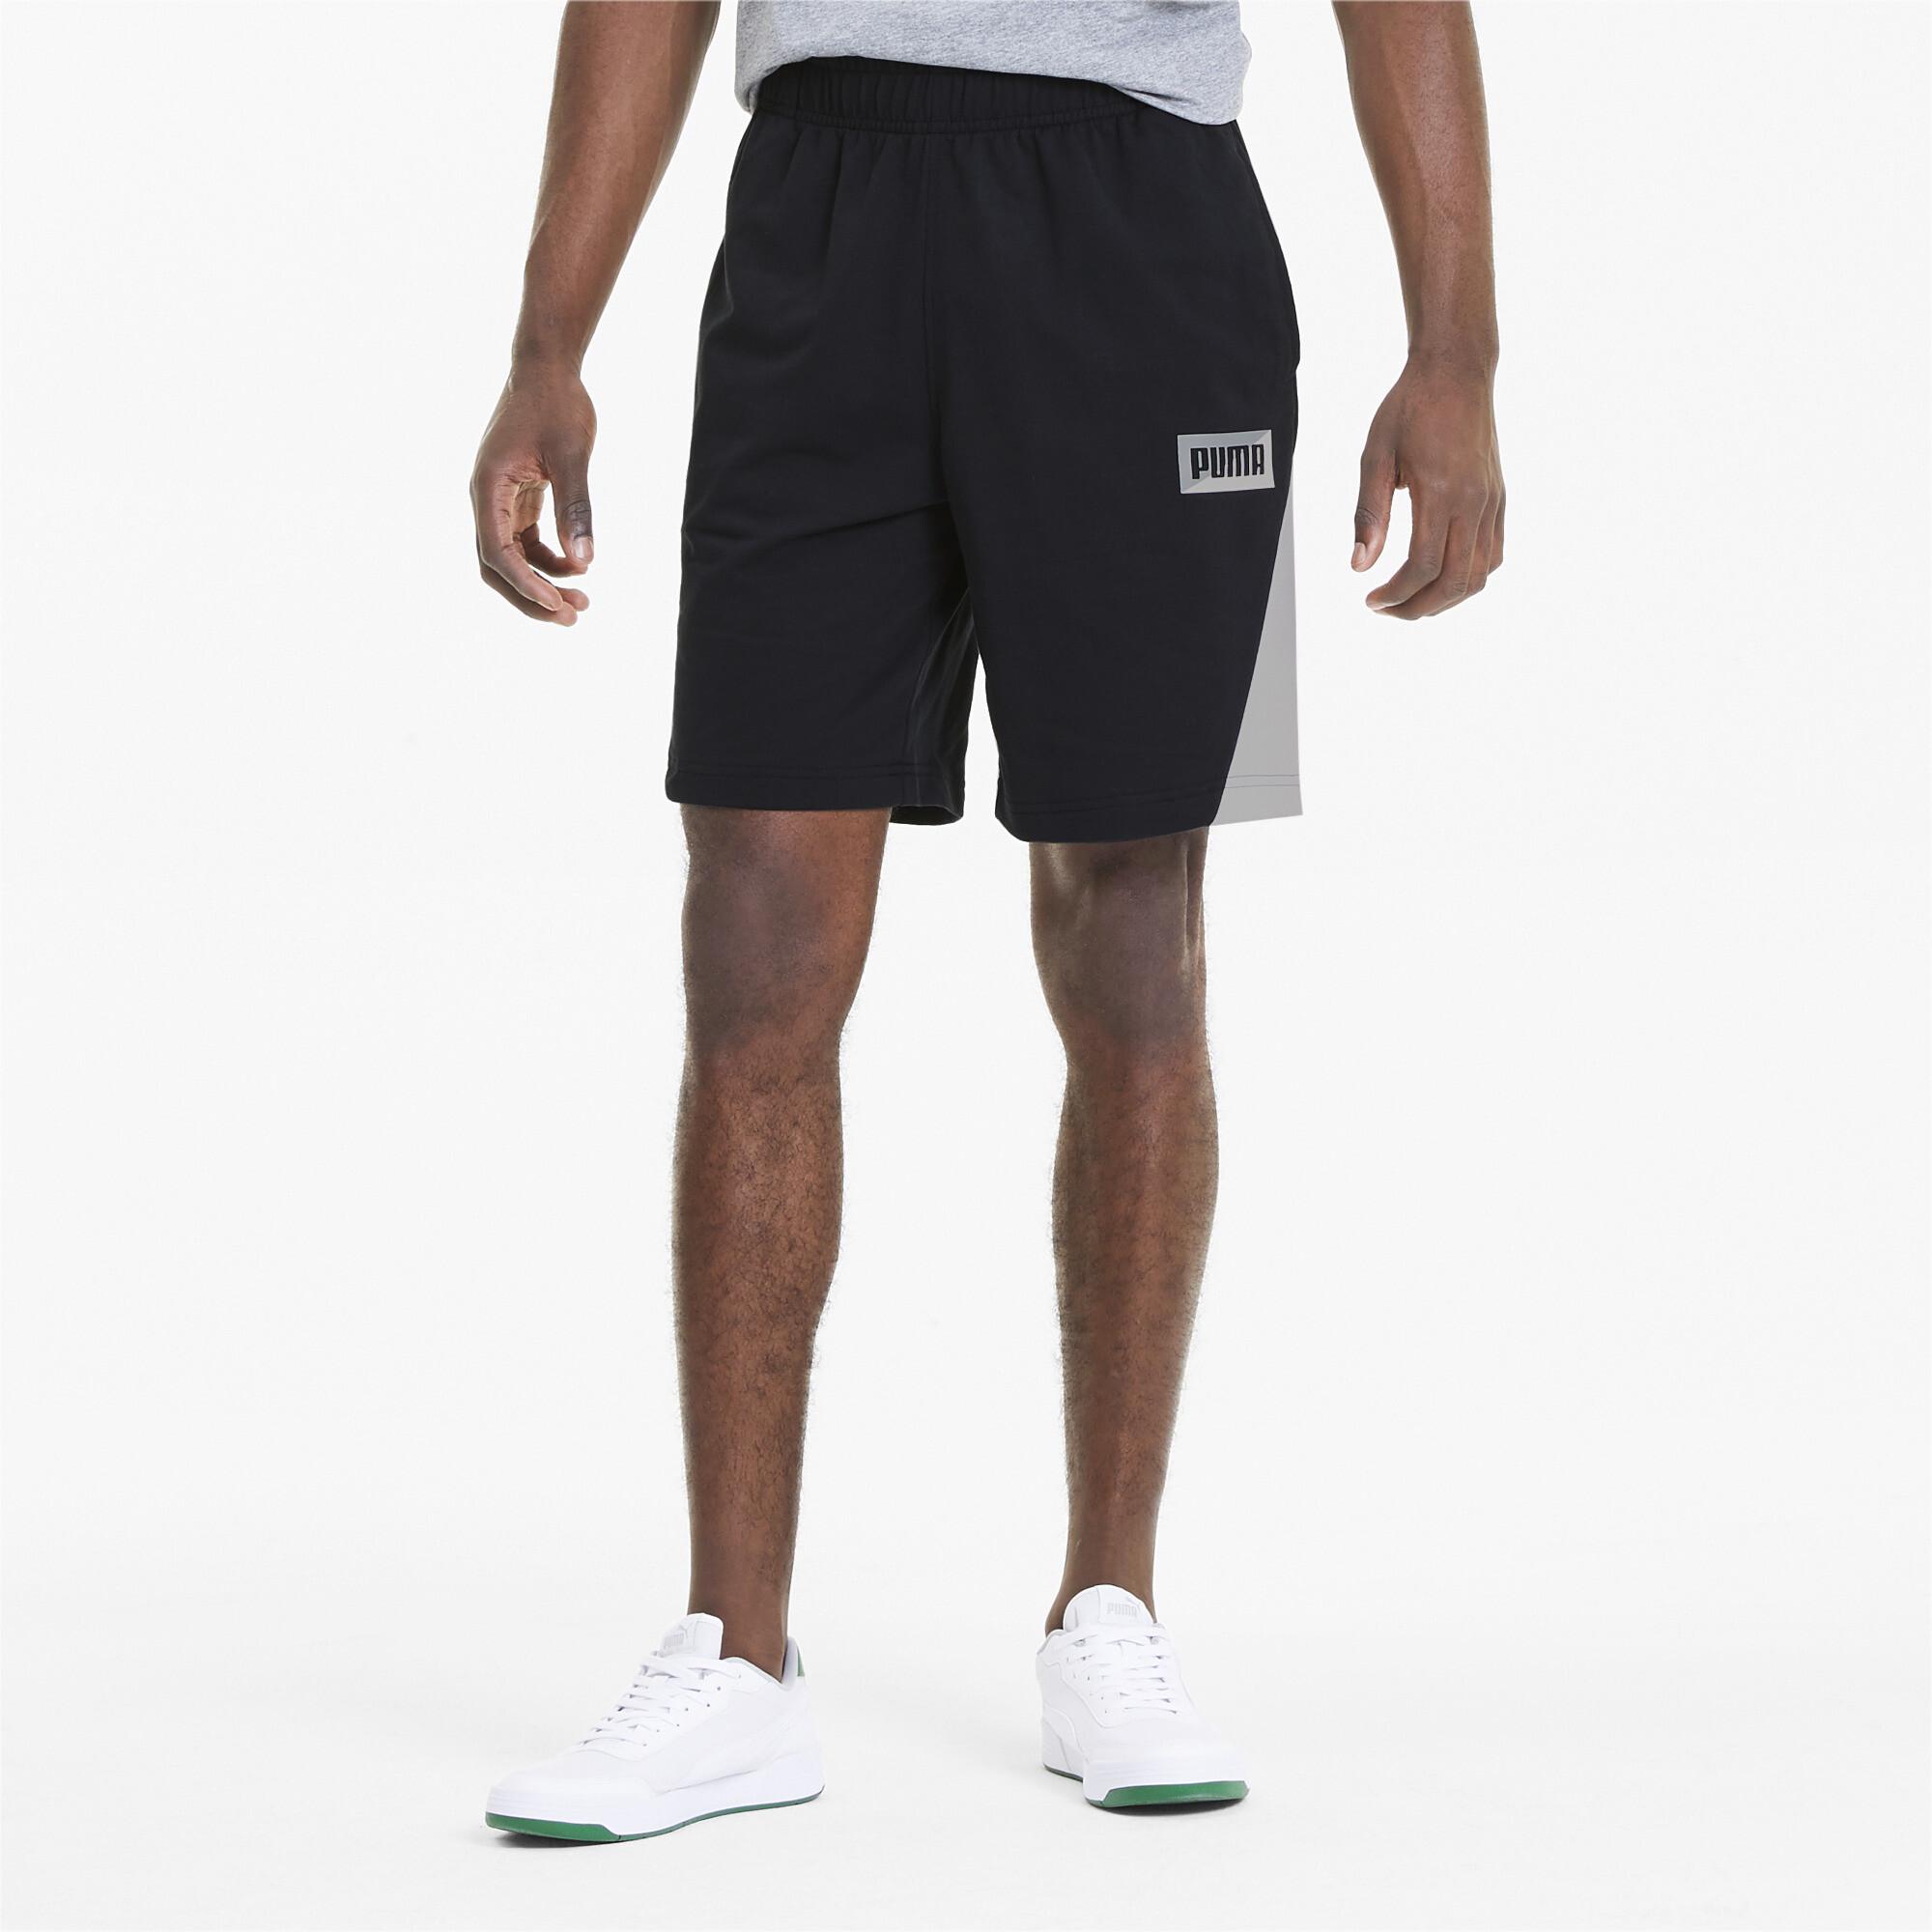 PUMA-Summer-Print-Men-039-s-Shorts-Men-Knitted-Shorts-Basics thumbnail 9